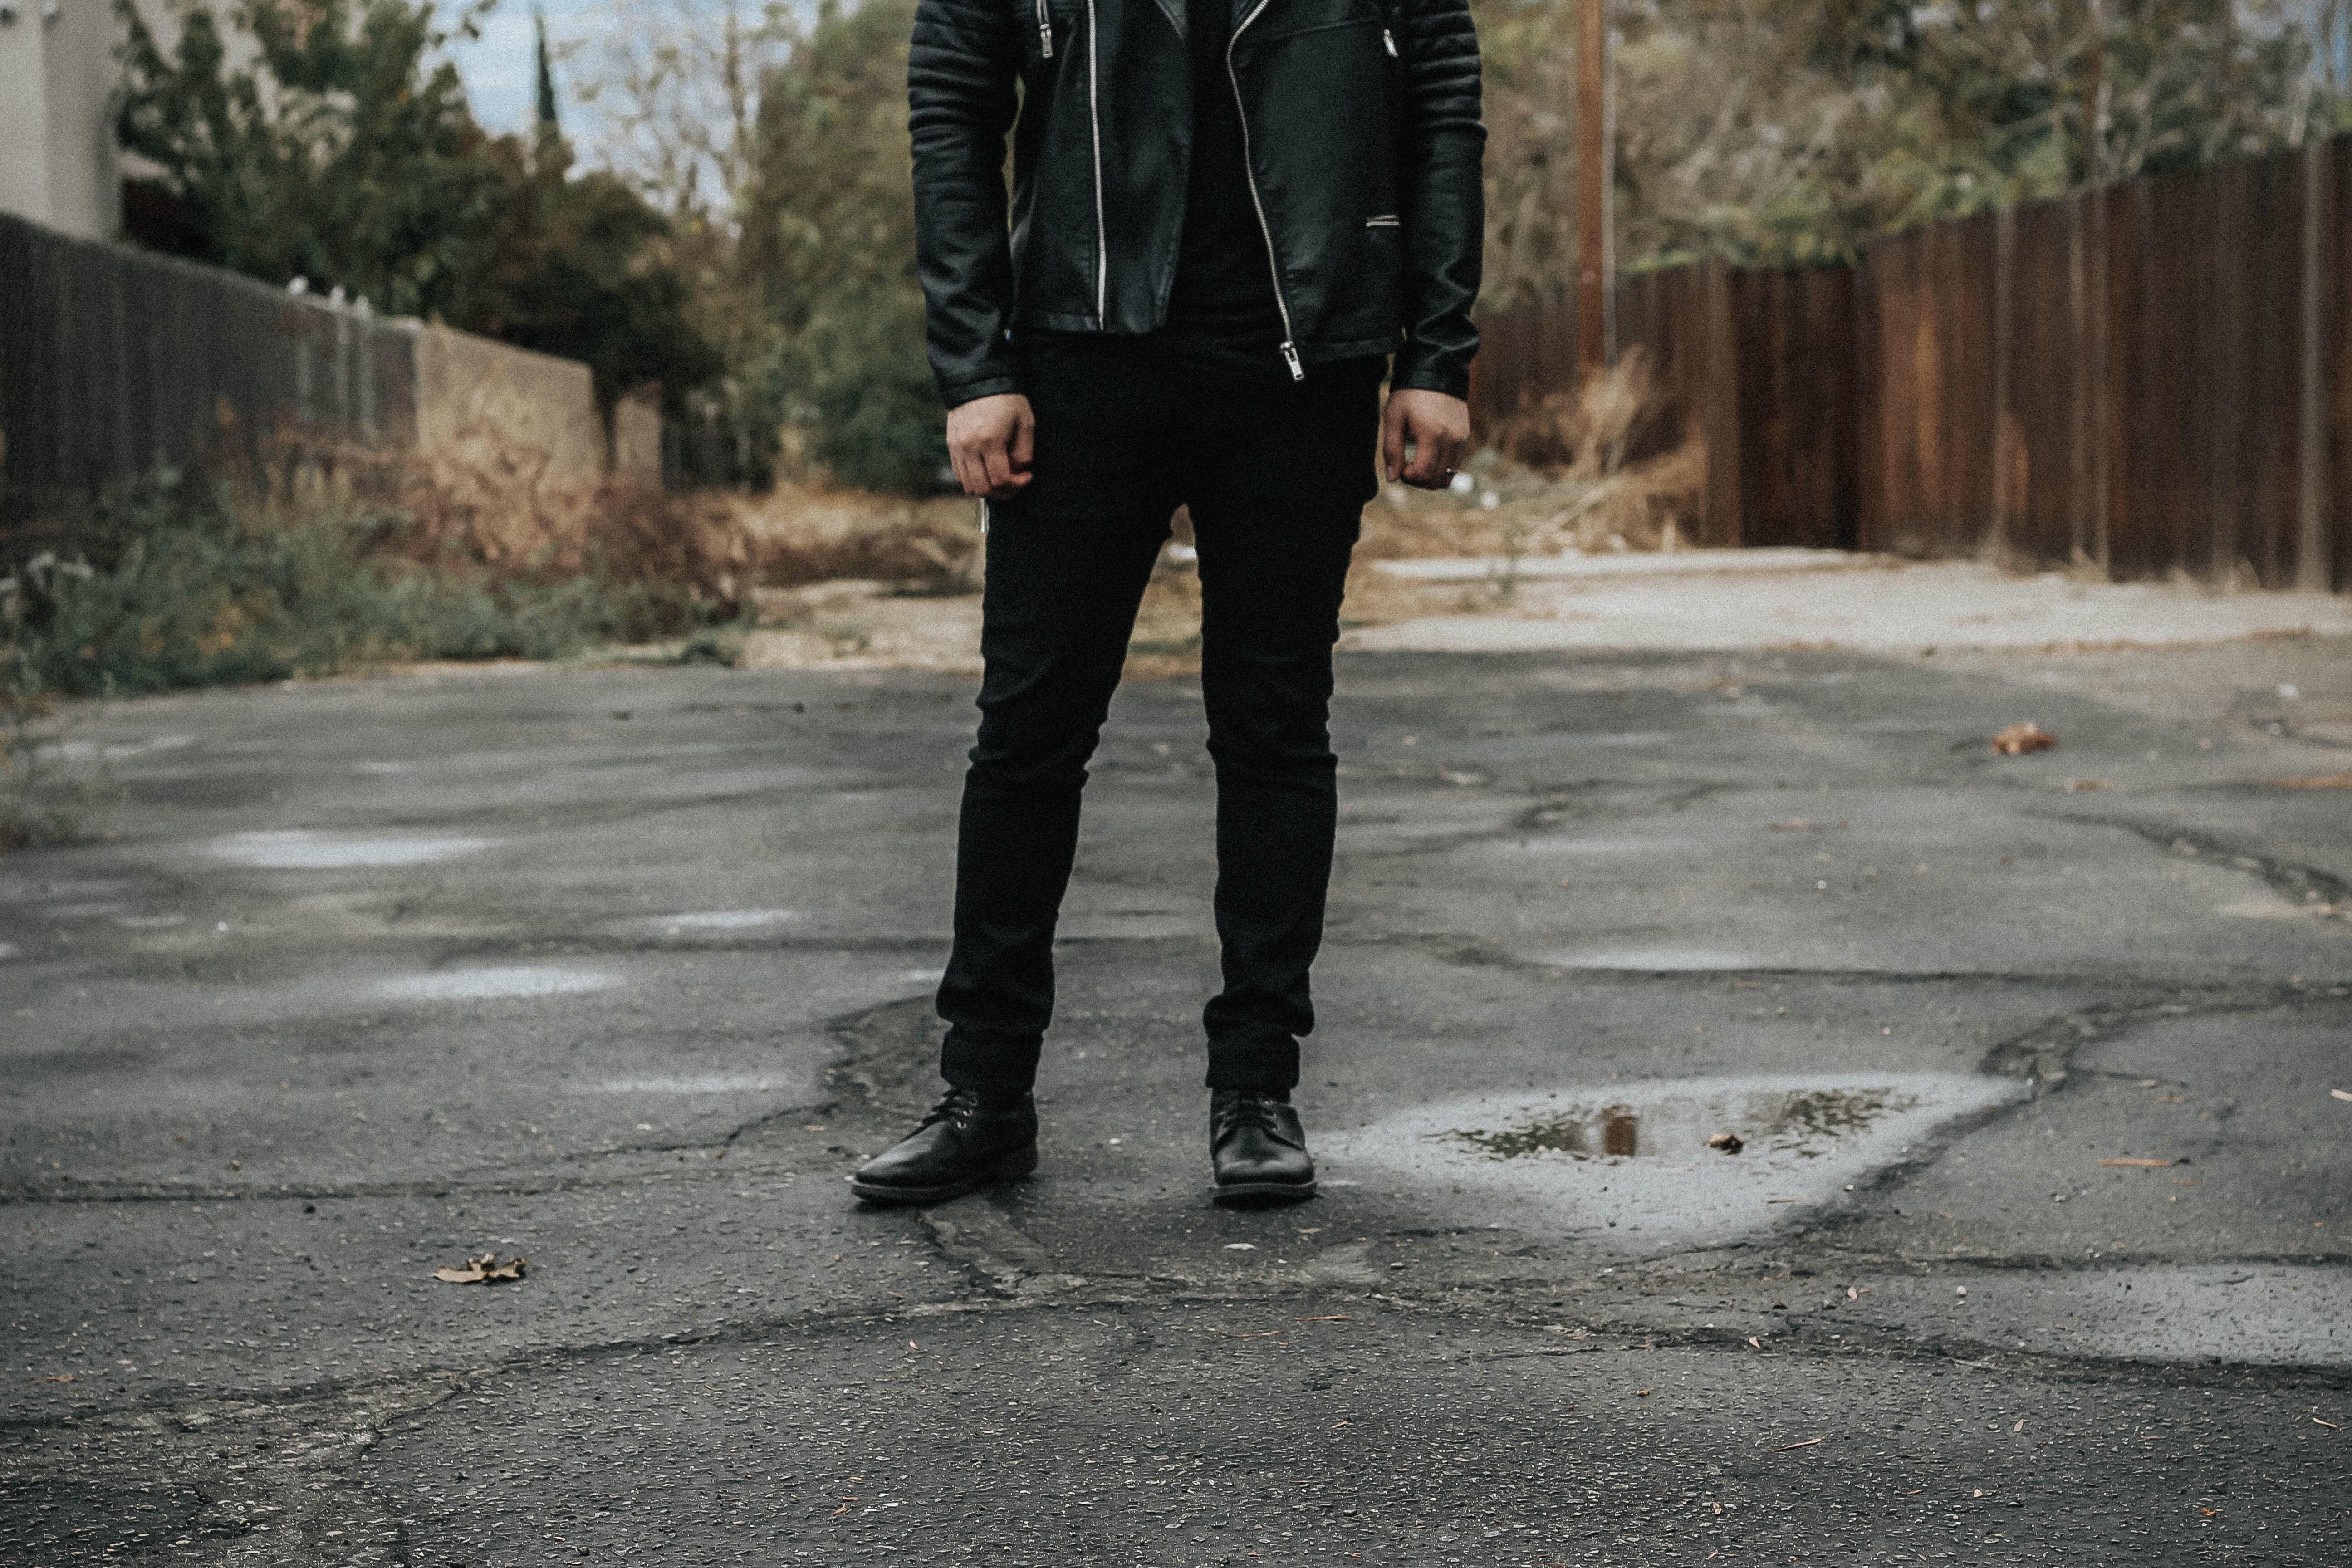 man wearing black pants standing on gray road